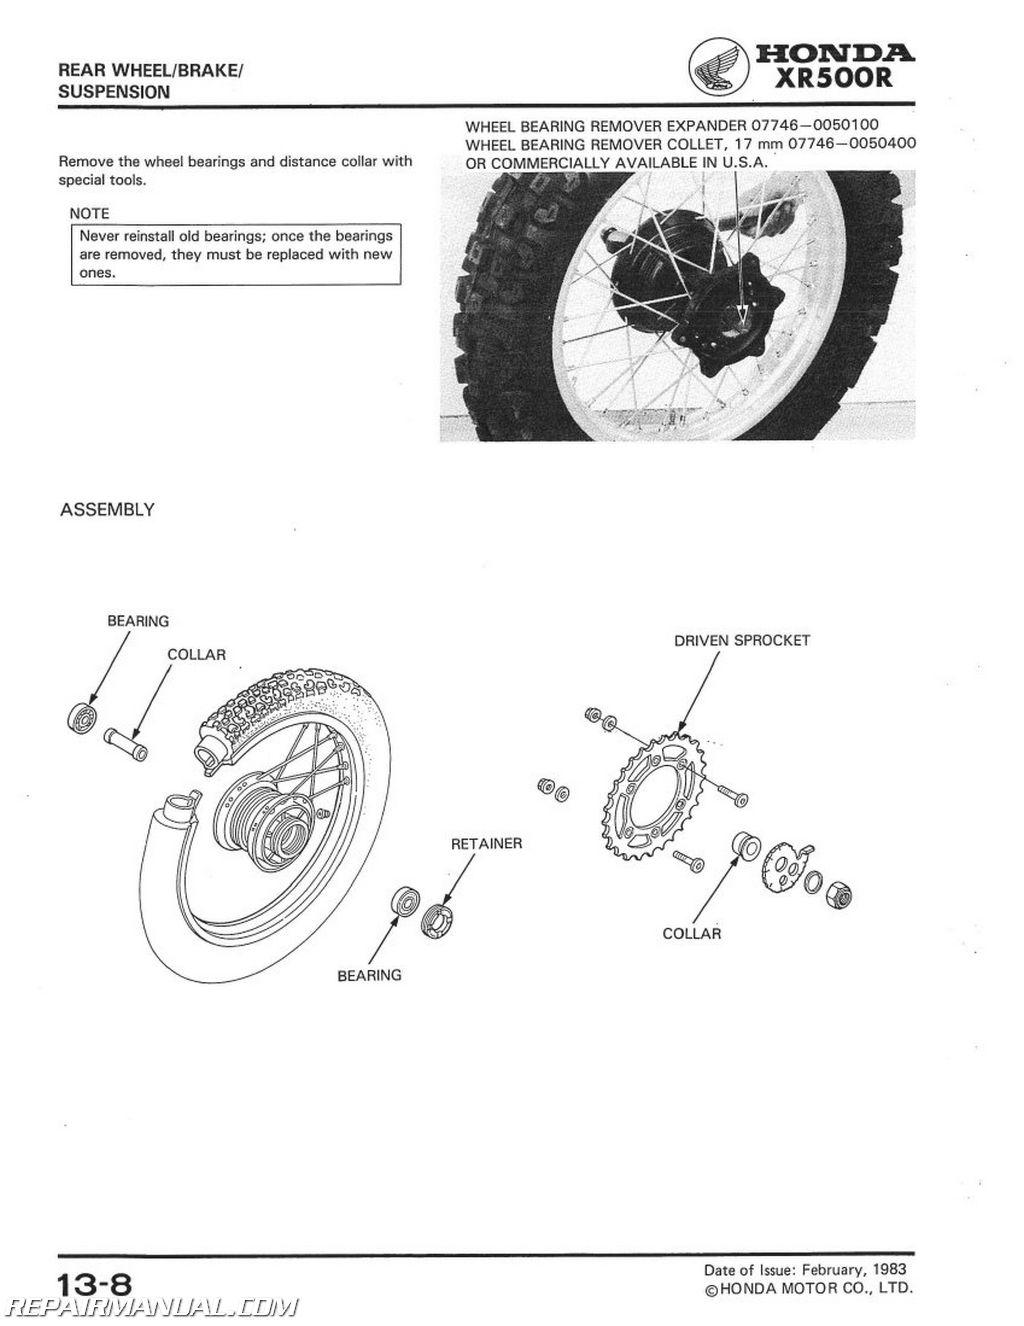 white rodgers 1311 wiring diagram hvac pdf 1361 102 1inch